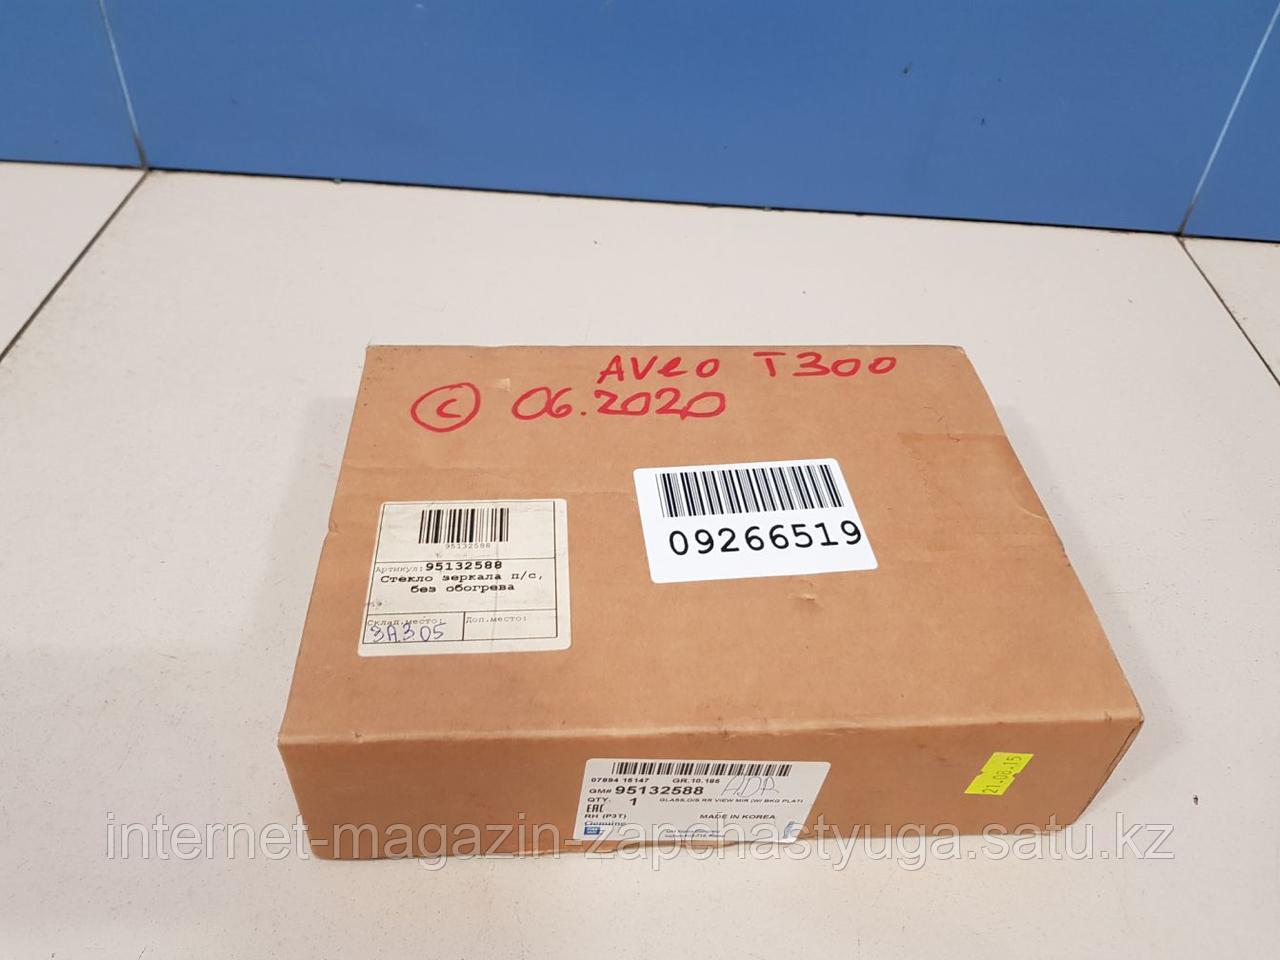 95132588 Зеркальный элемент правый для Chevrolet Aveo T300 2011-2015 Б/У - фото 2